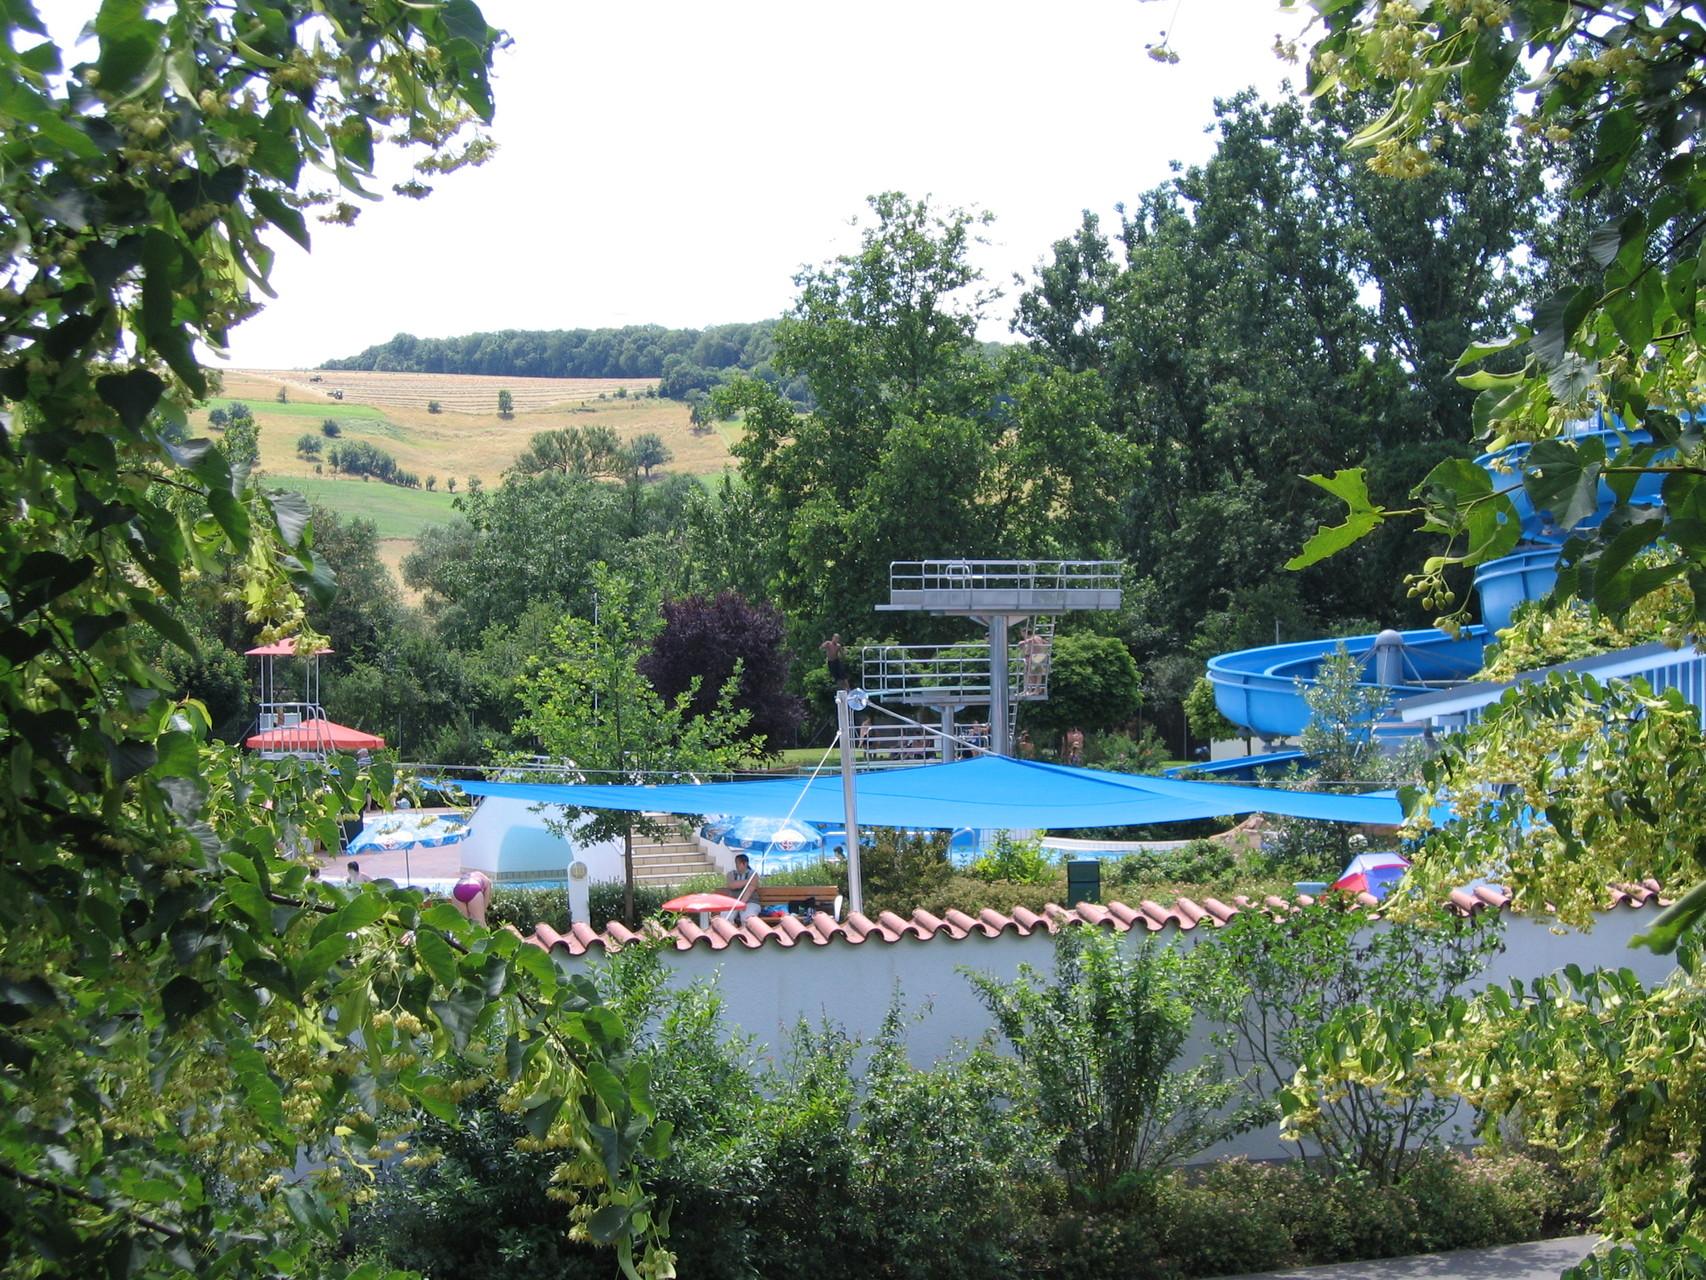 Freibad Bad Sobernheim